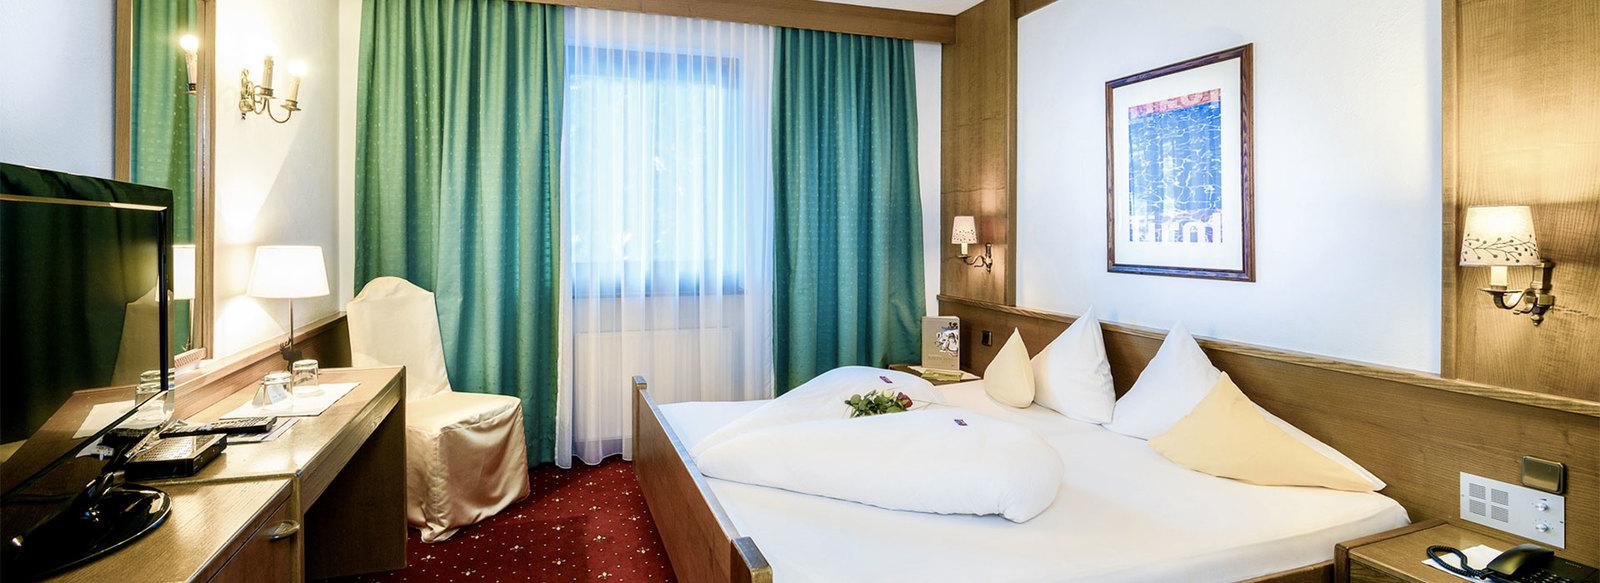 Confortevole Hotel a Seefeld